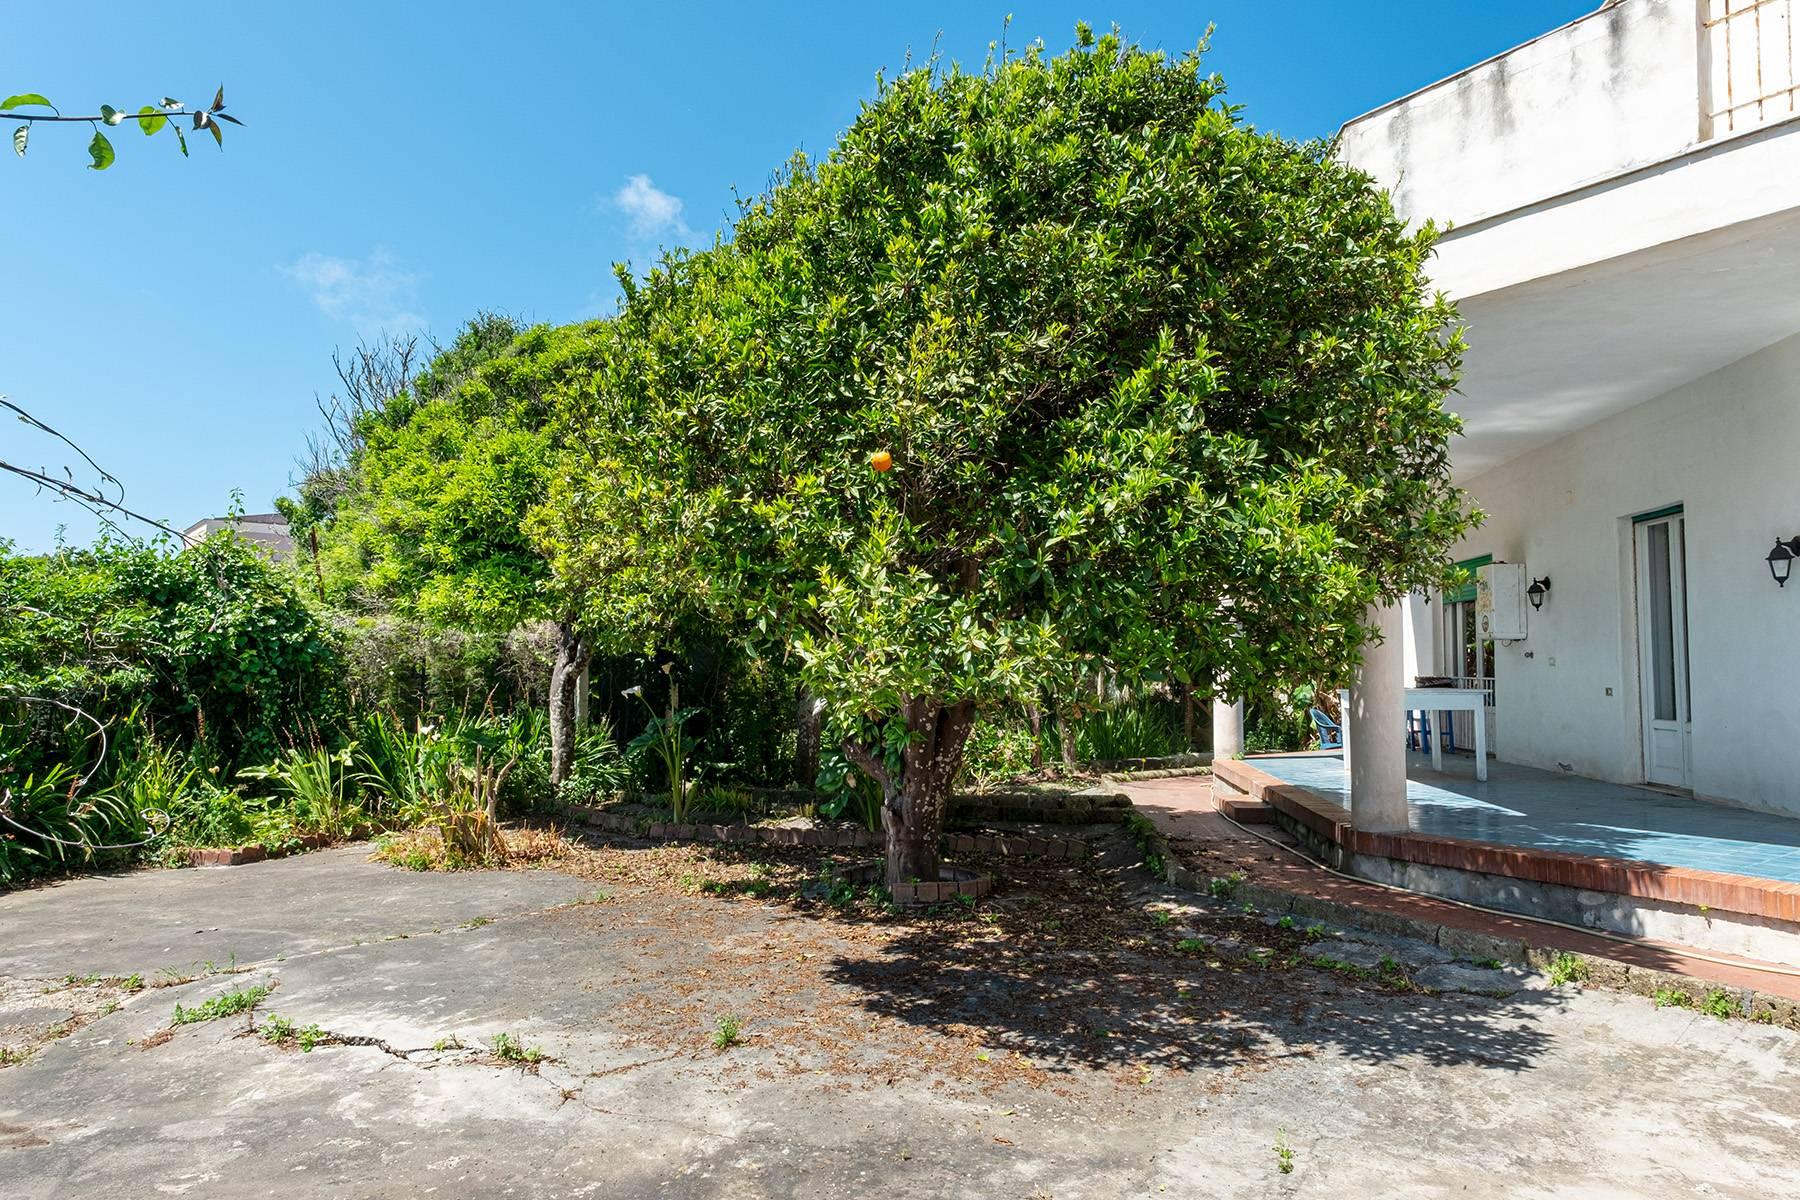 Casa indipendente in Vendita a Procida: 5 locali, 300 mq - Foto 17